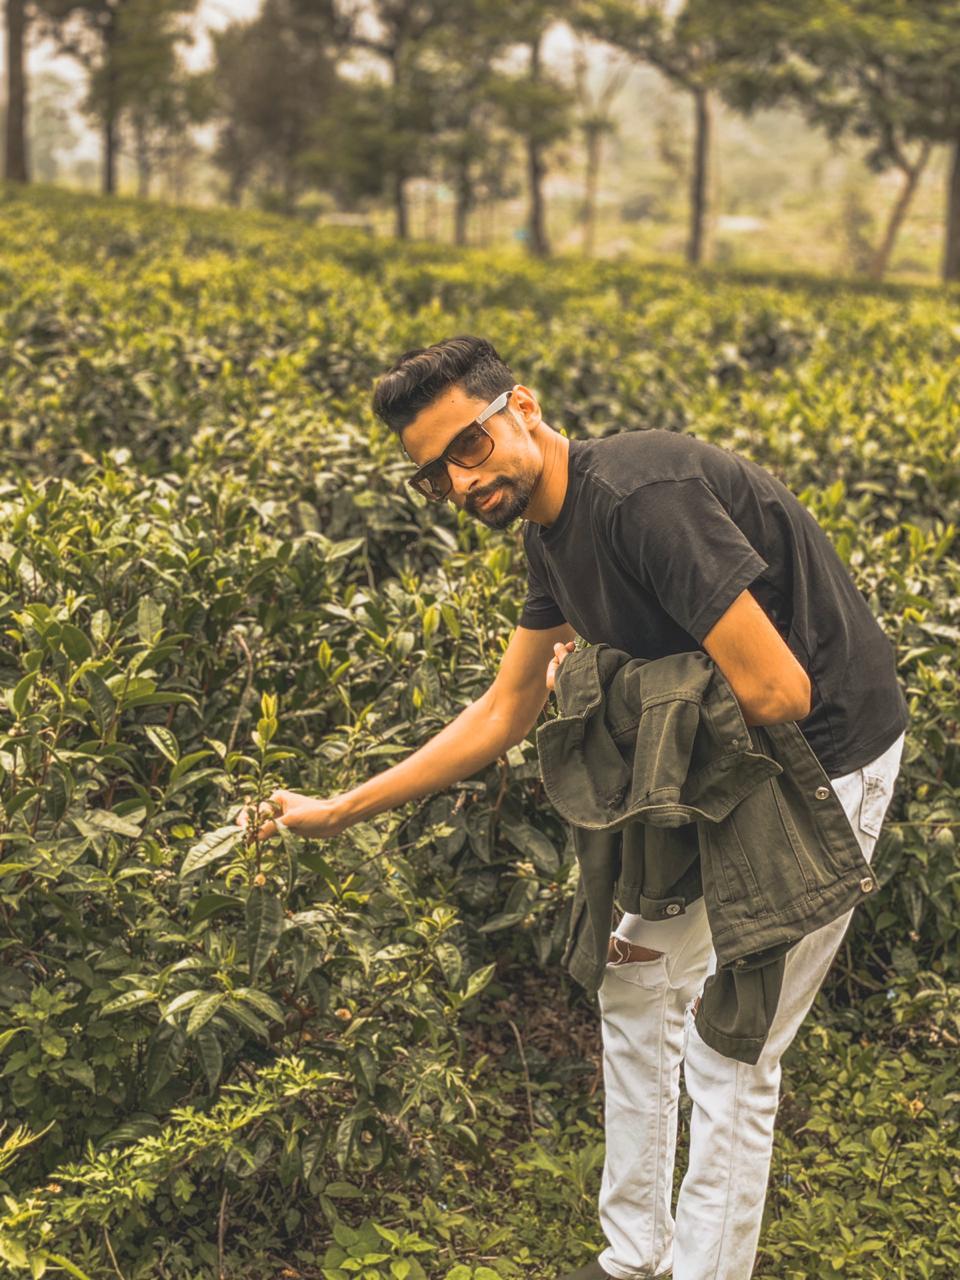 TSG's Top Best Places To Visit In Srilanka / Nuwara Eliya - Tea Plantations